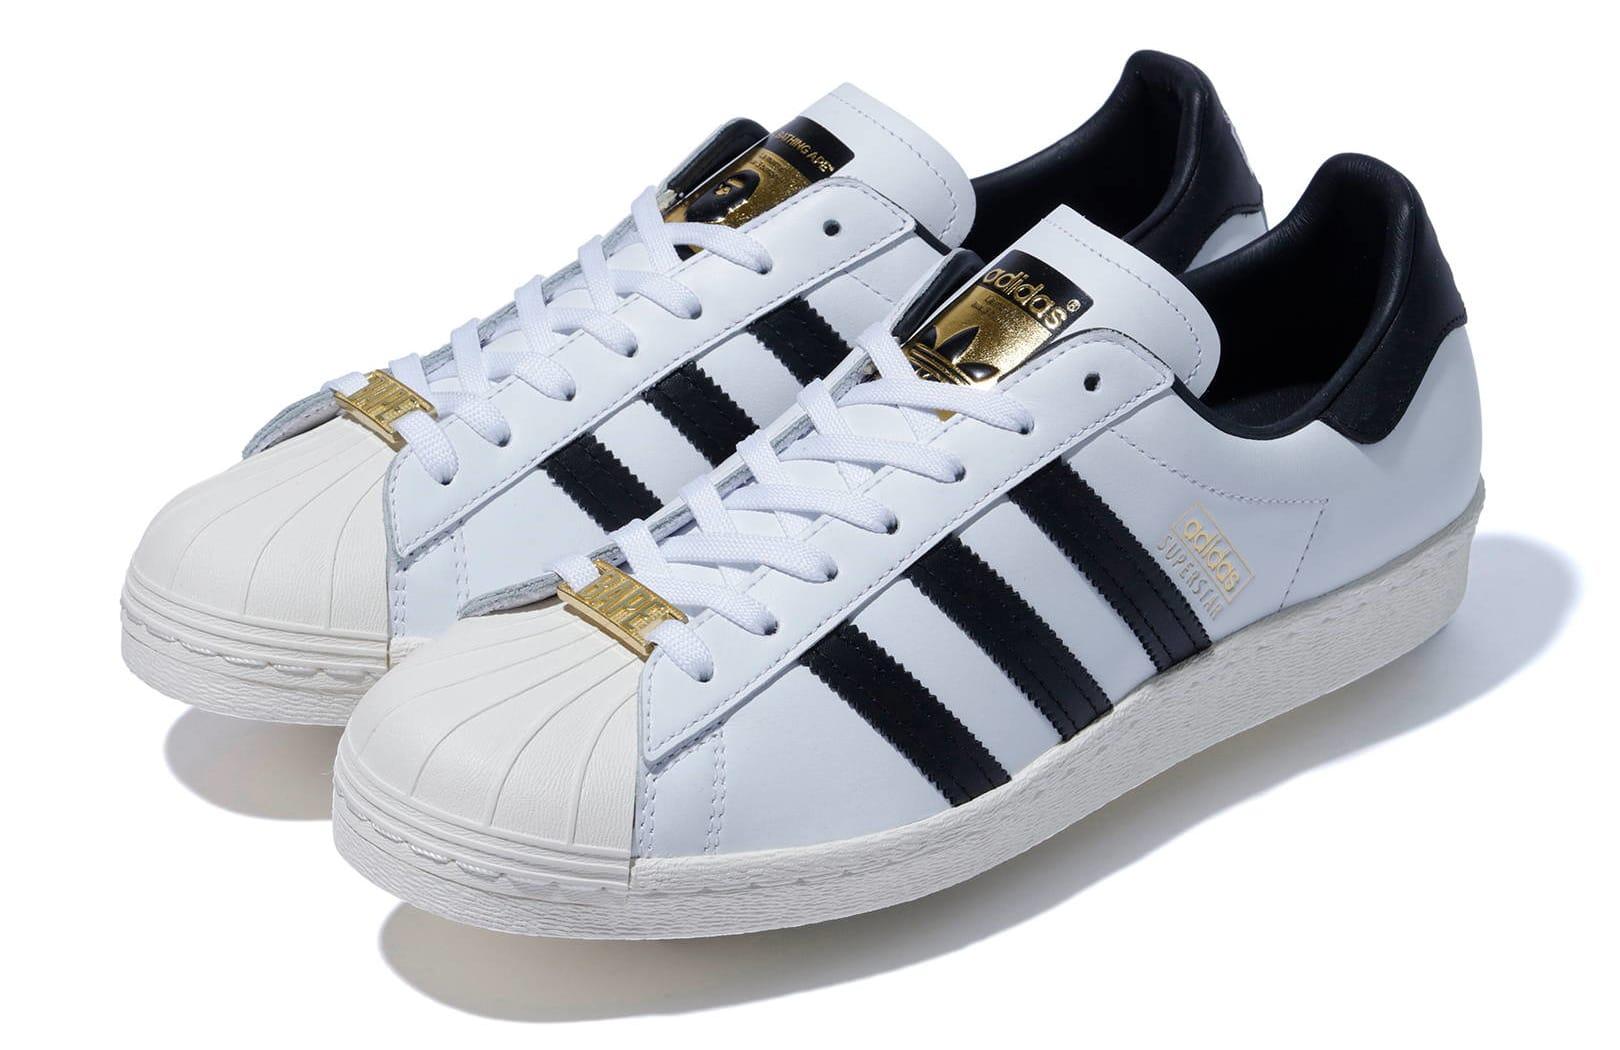 Bape x Adidas Originals Superstar Pair